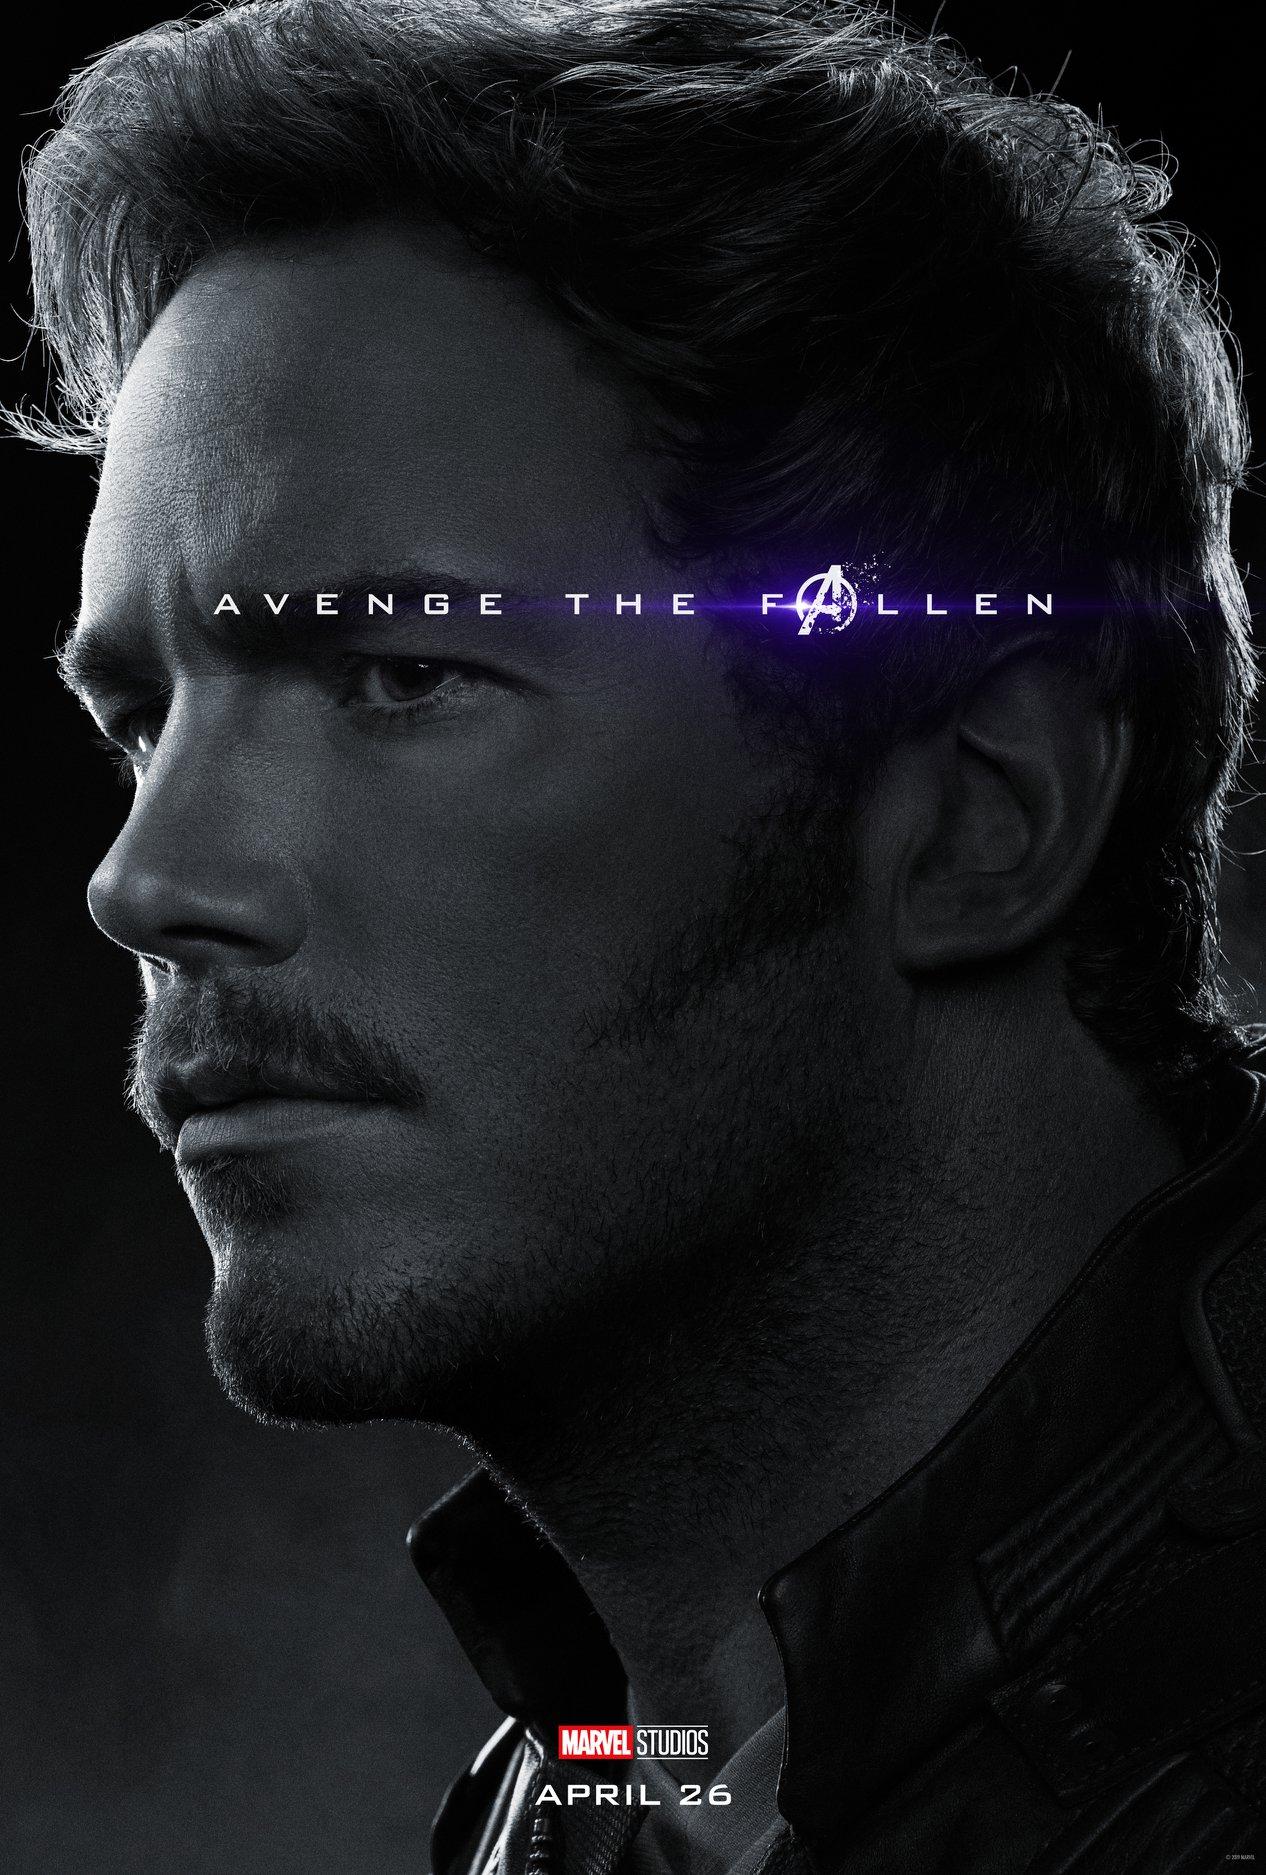 avengers_endgame_p21.png